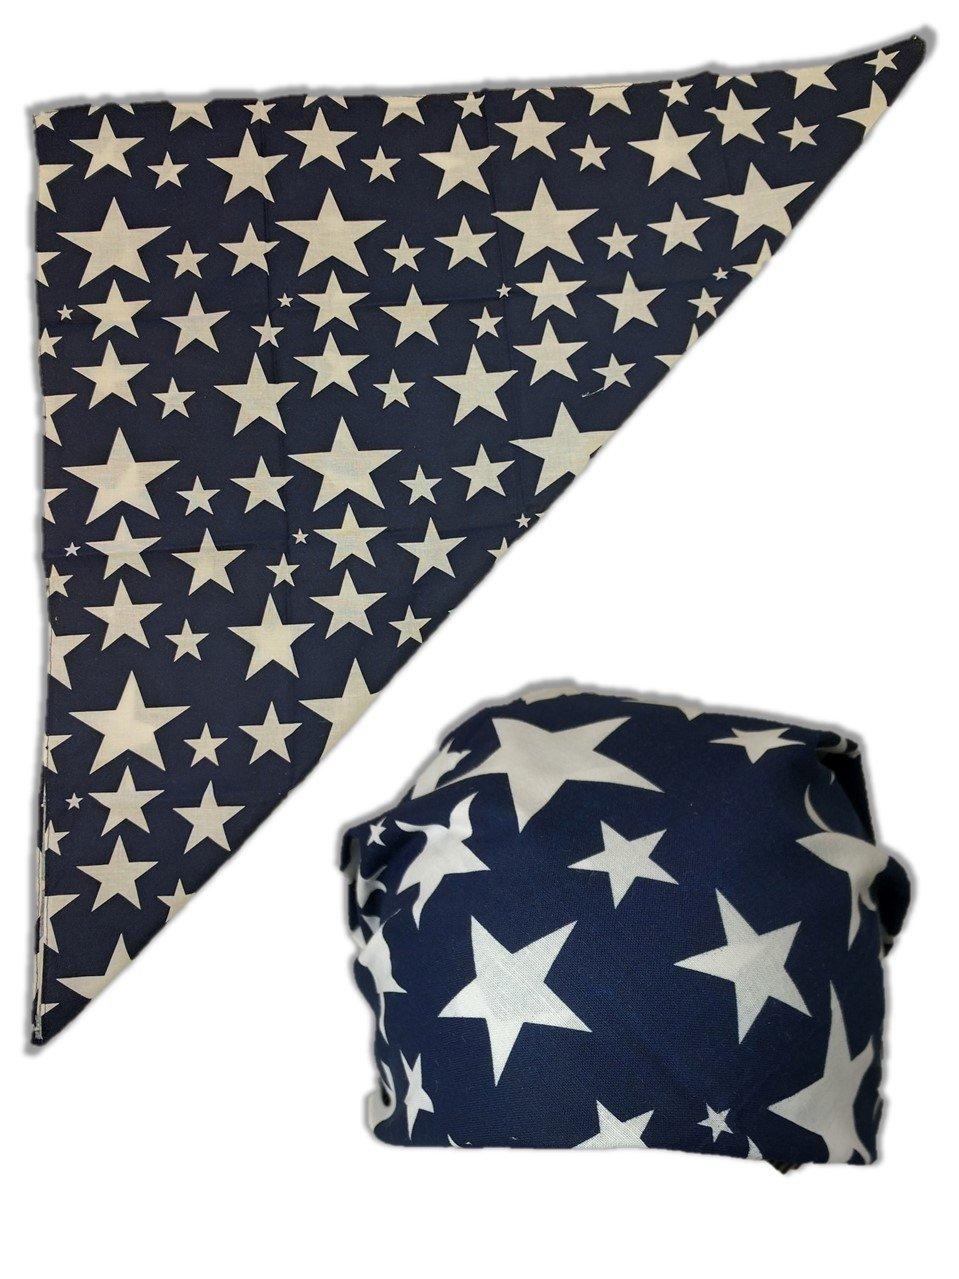 USA Patriotic Colored Stars Bandana -Blue